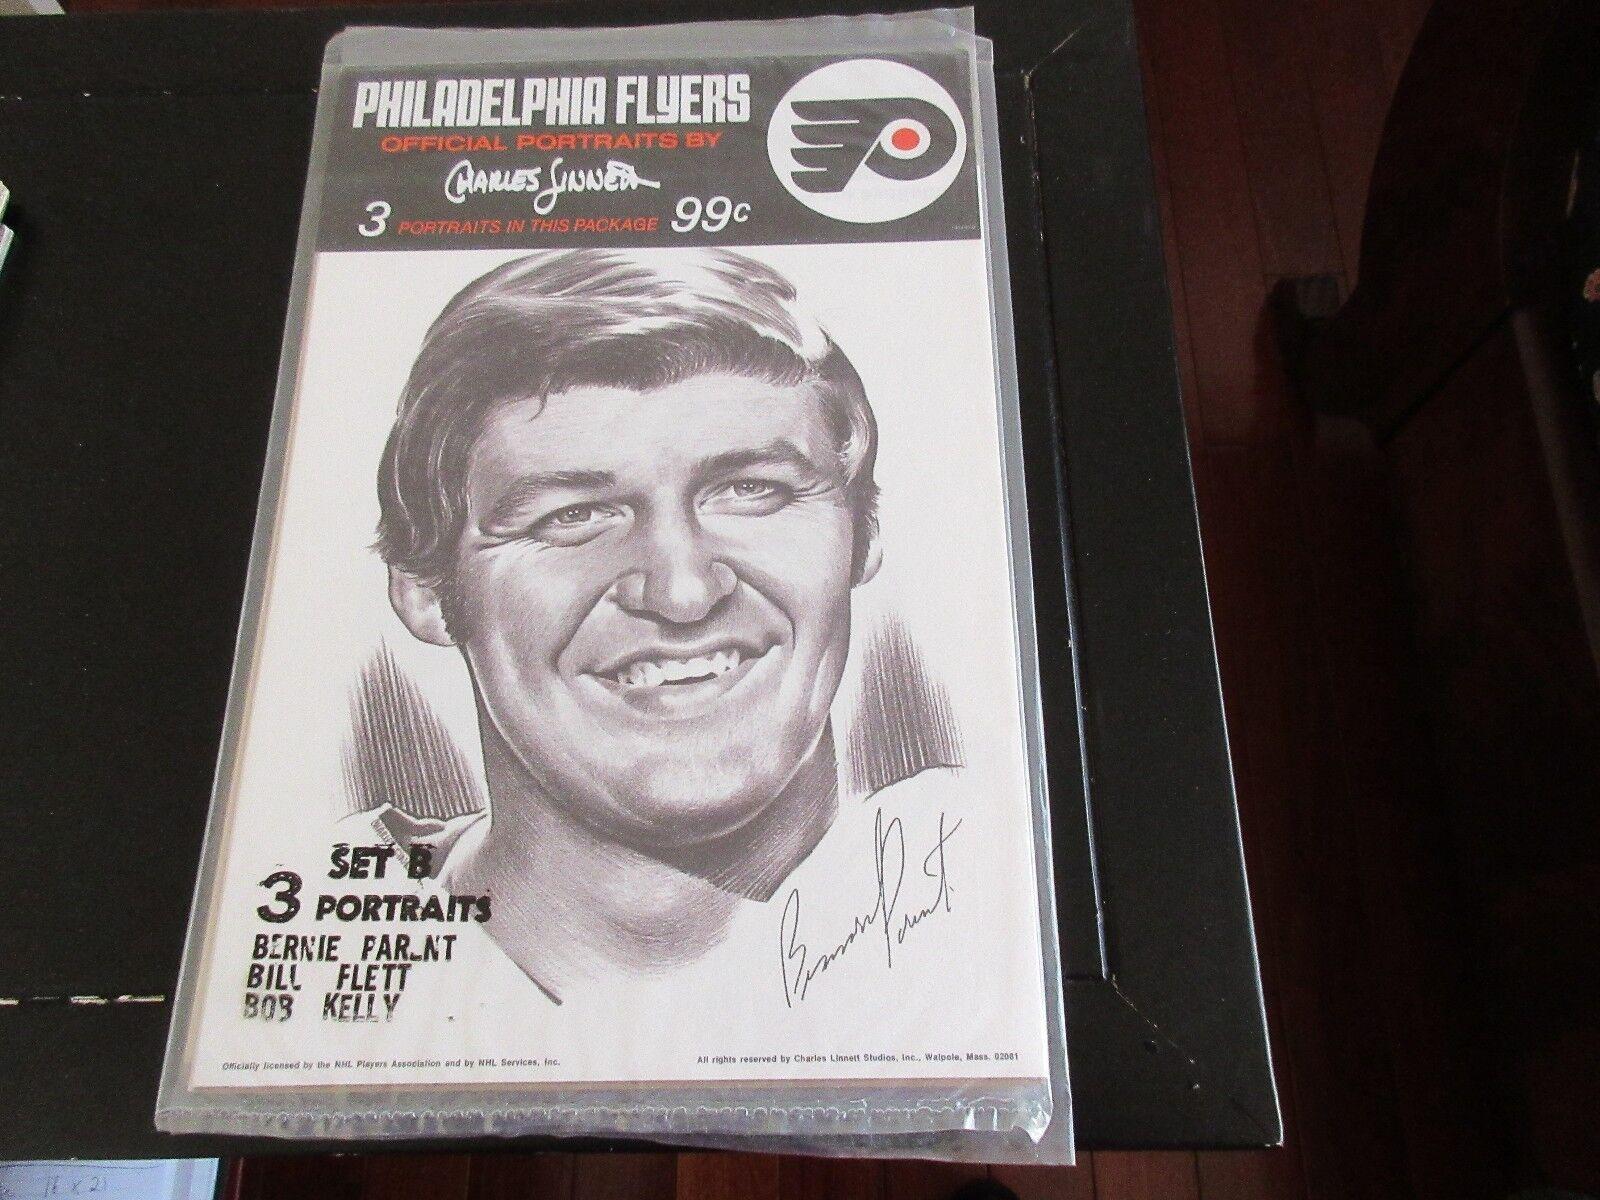 Philadelphia Flyers ,Official Portraits by Charles Linn